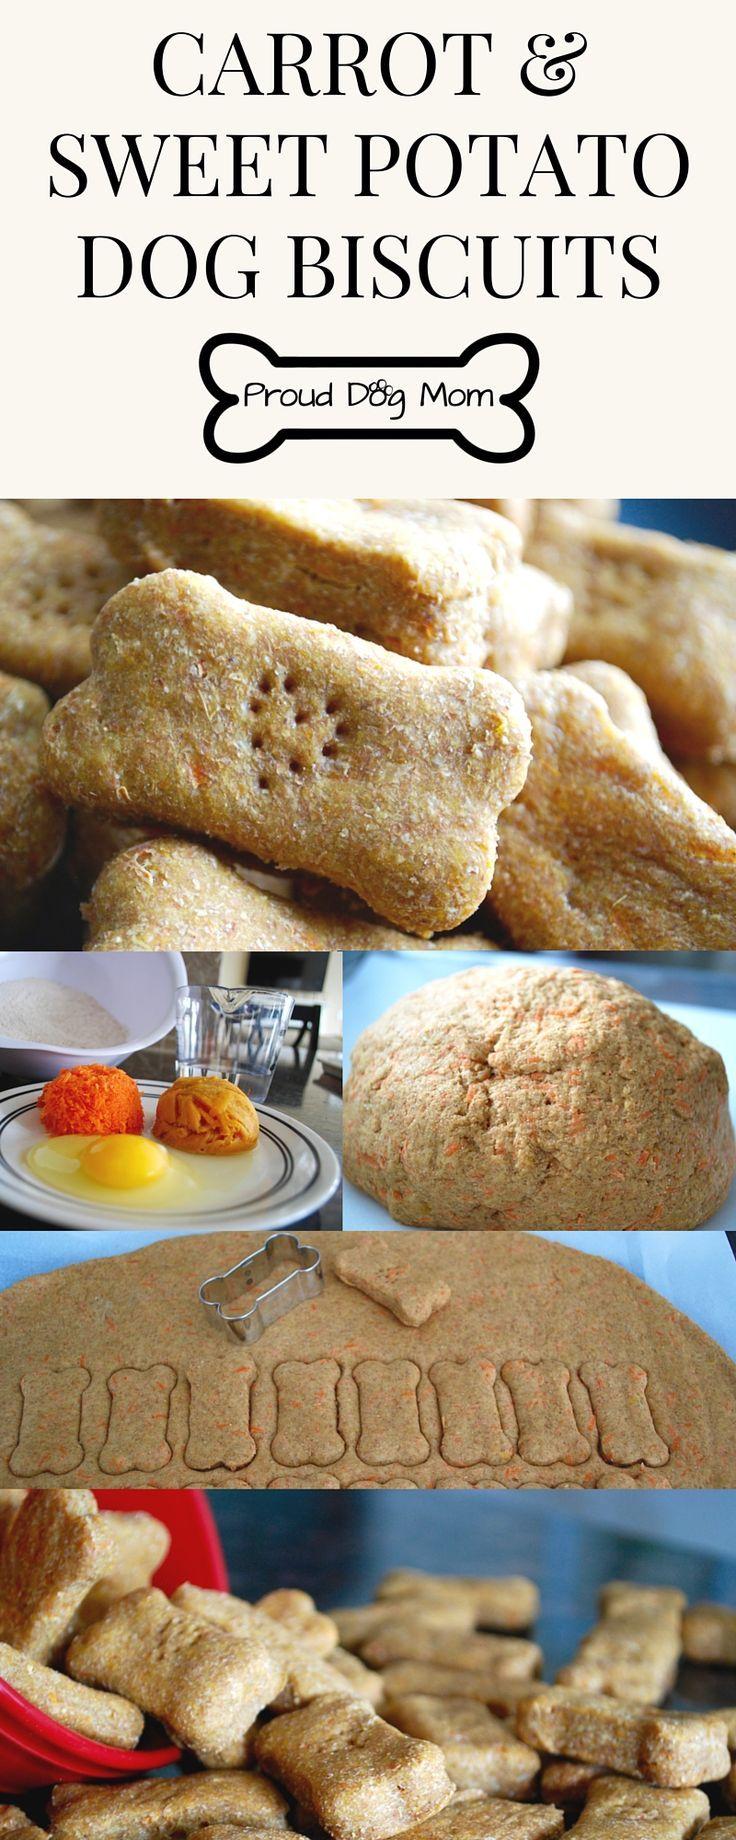 Easy Carrot & Sweet Potato Dog Biscuits   DIY Dog Treats   Healthy Dog Treats  